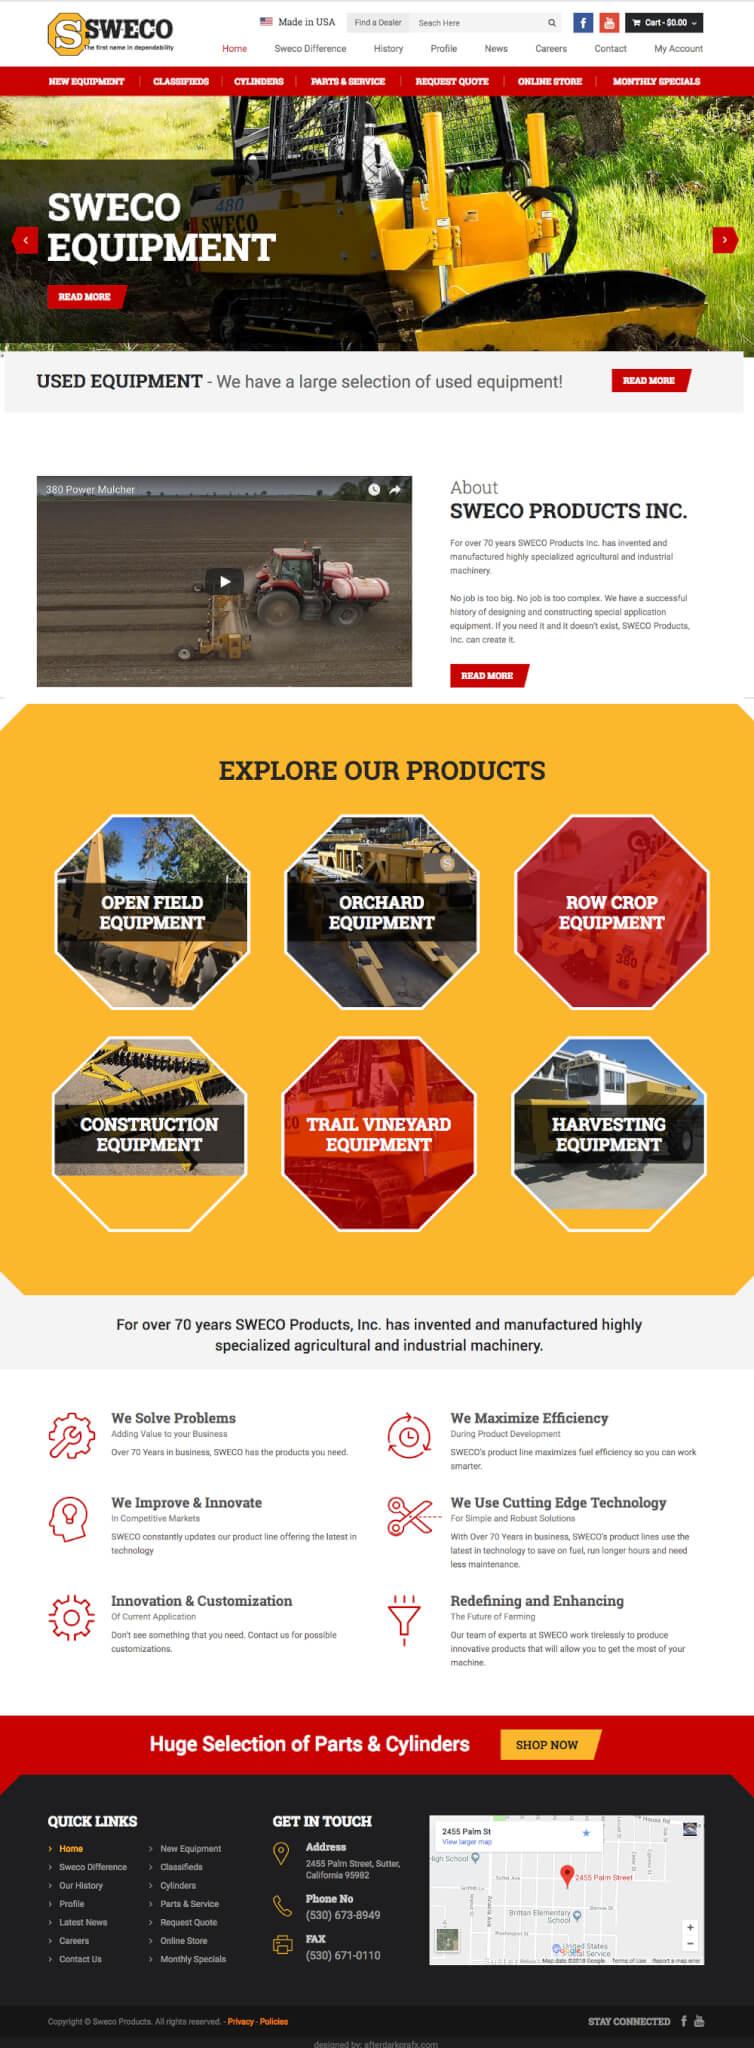 SWECO Homepage Website Design WooCommerce After Dark Grafx San Diego